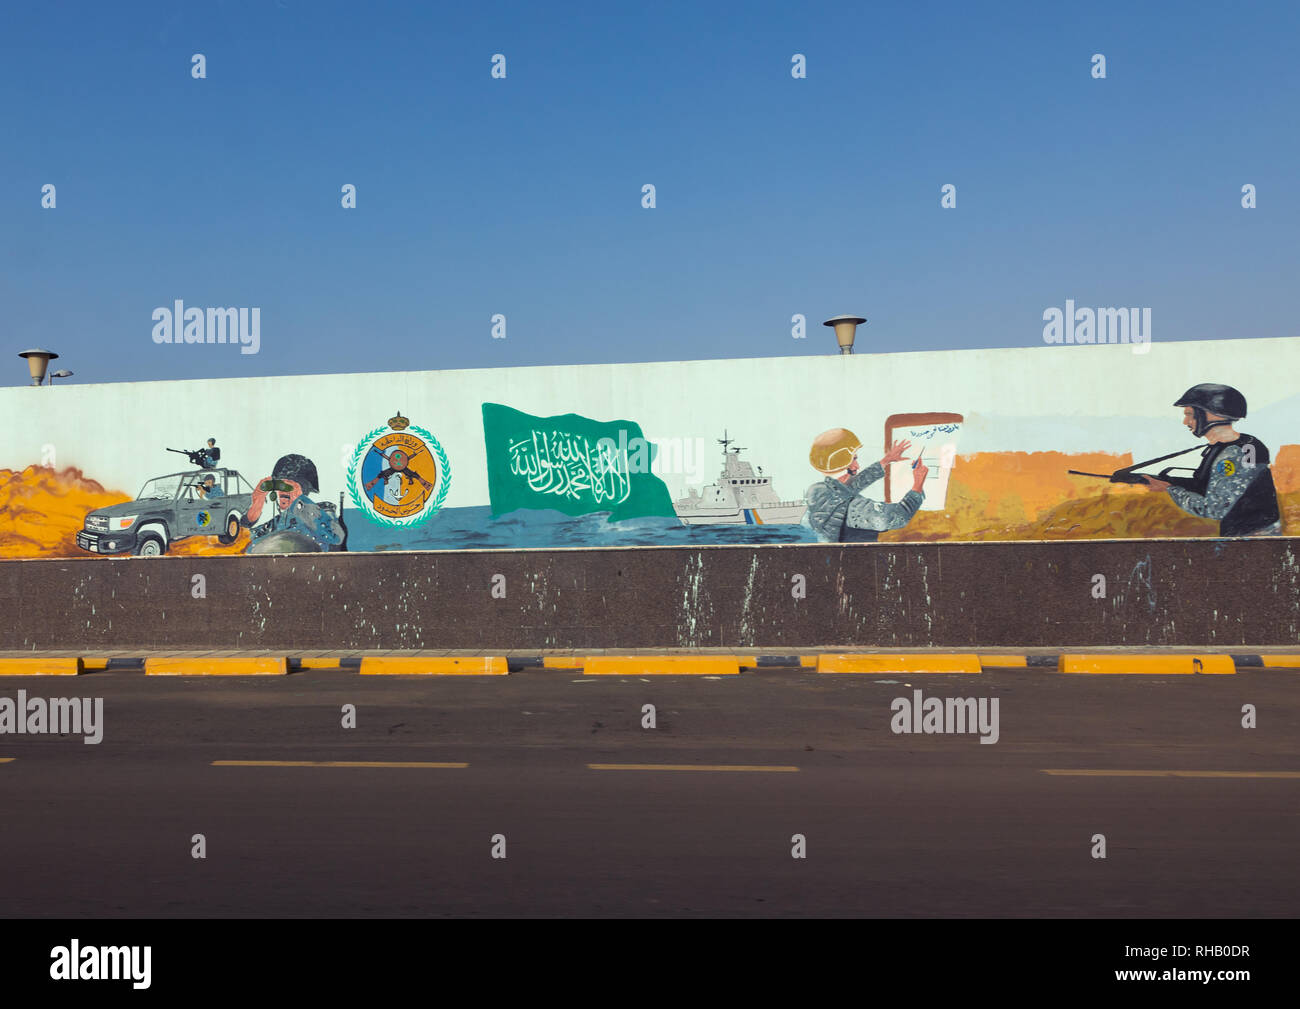 Esercito billbaord propaganda, Jizan Provincia, Jizan, Arabia Saudita Immagini Stock